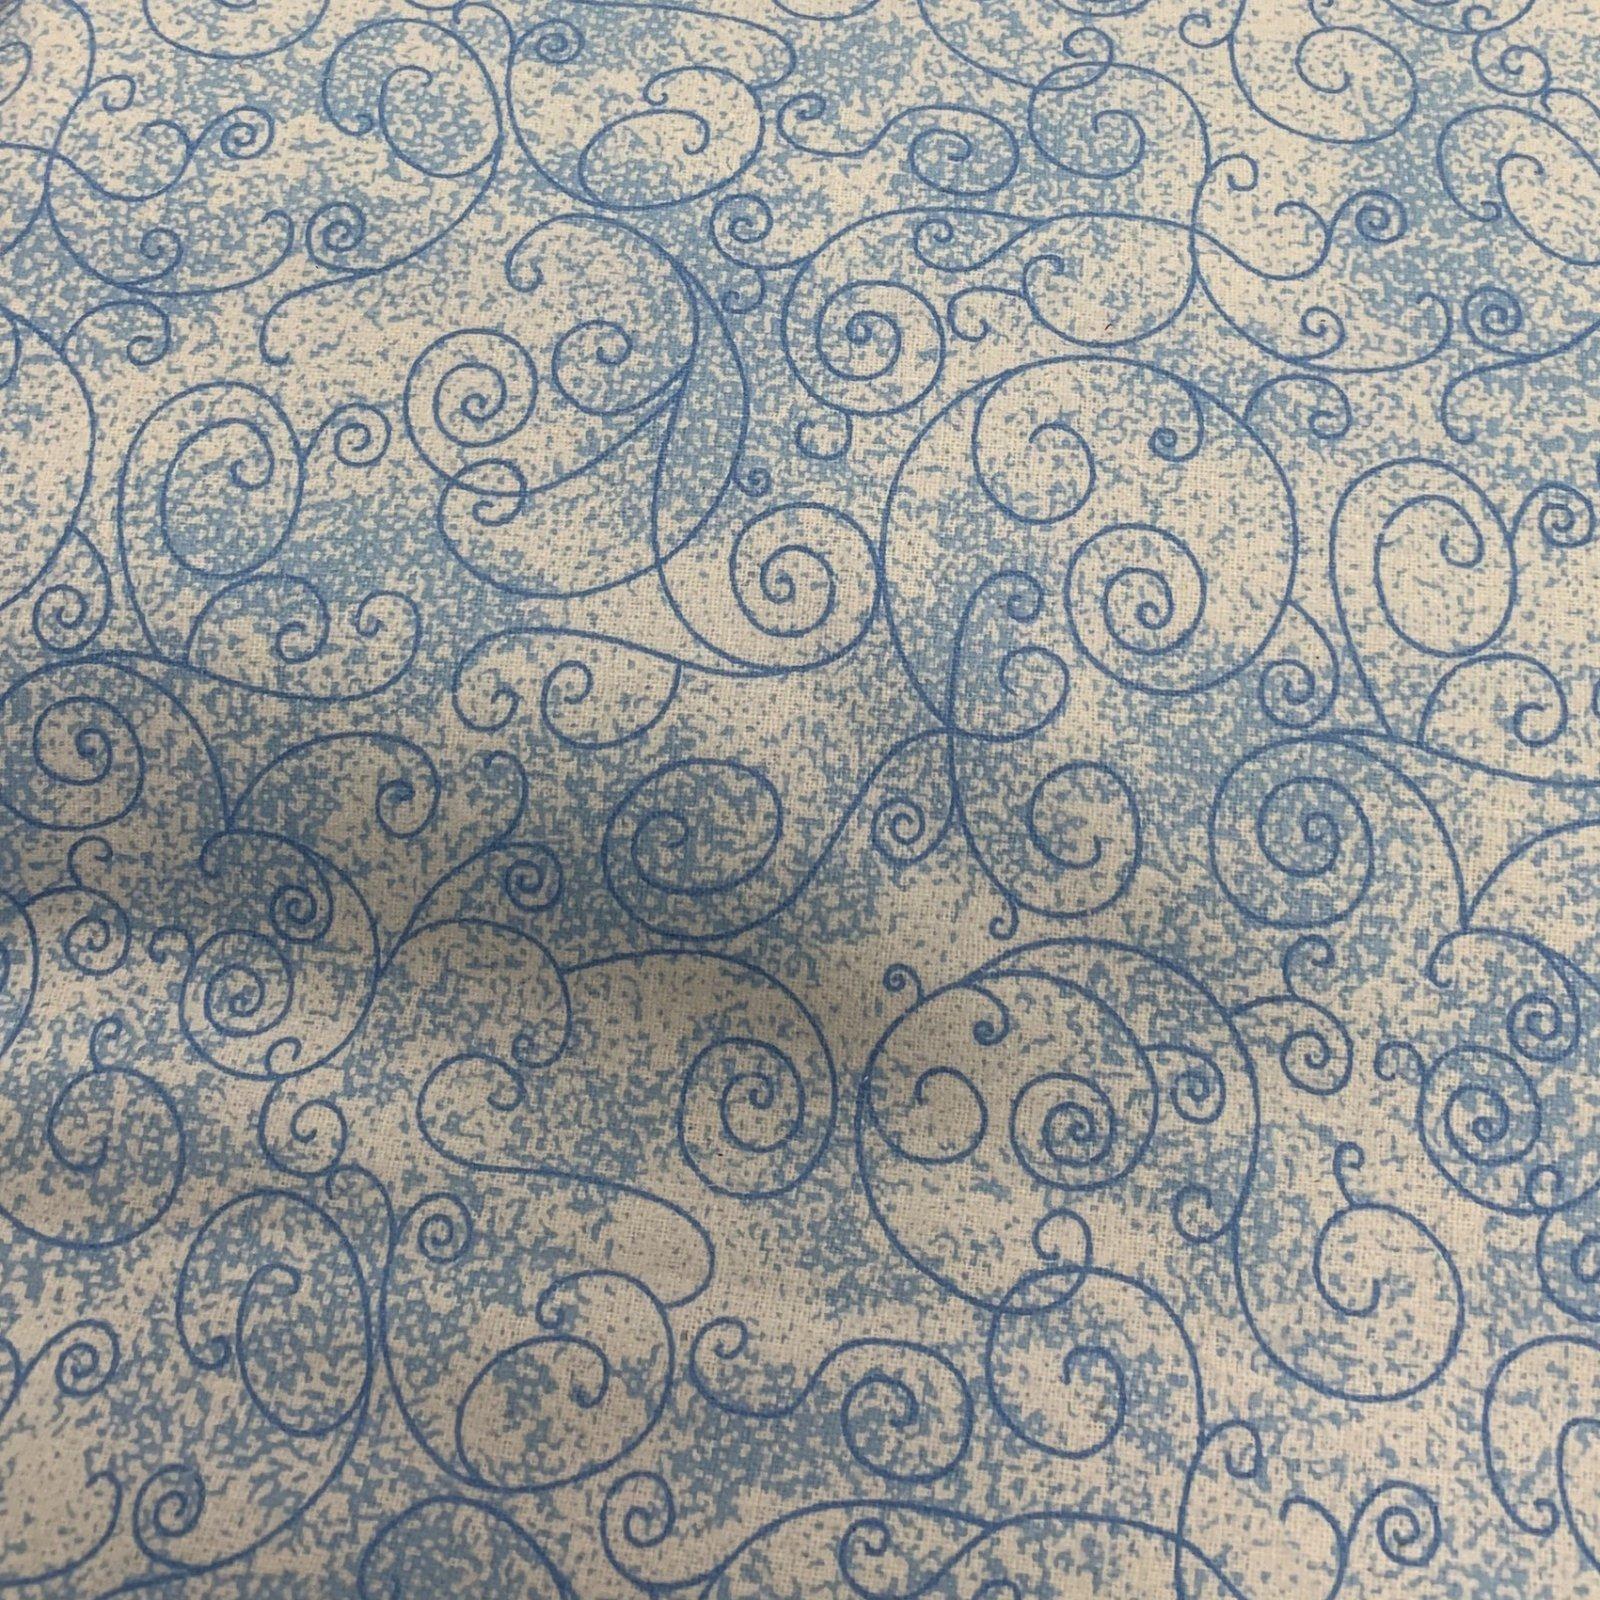 Flannel Pre-Cut - 2M - Willow - Sky Blue 108